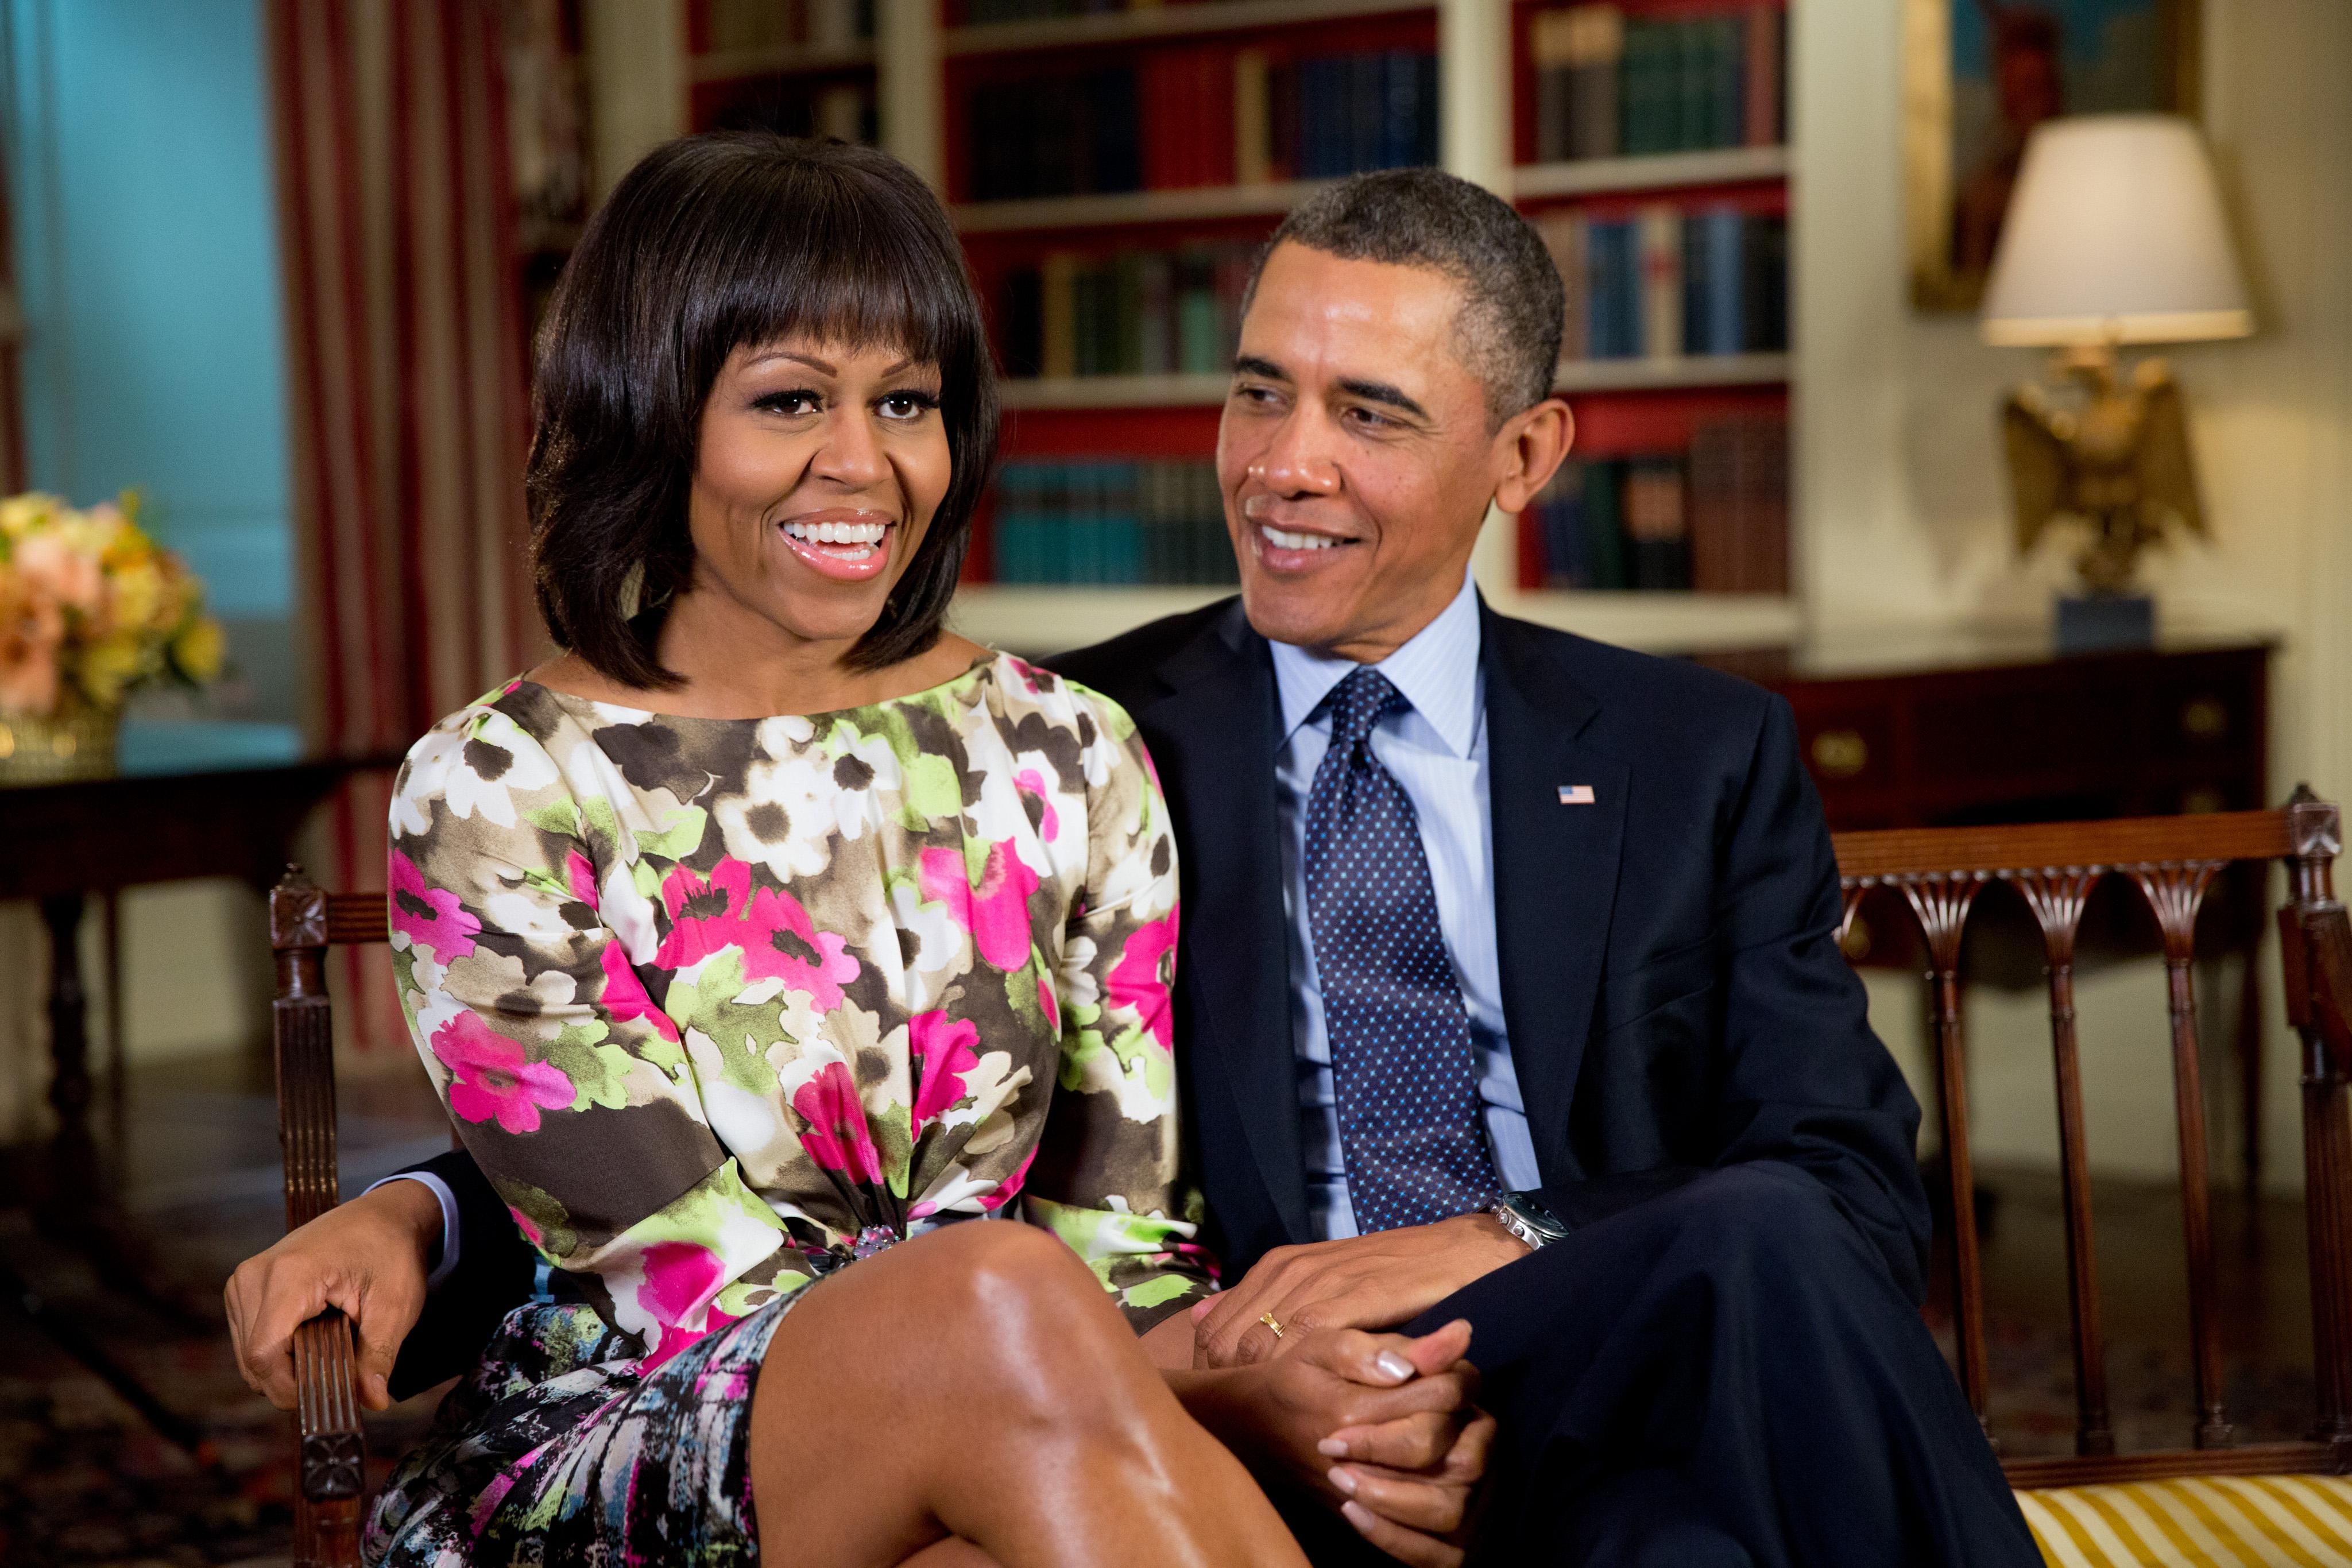 Michelle_and_Barack_Obama